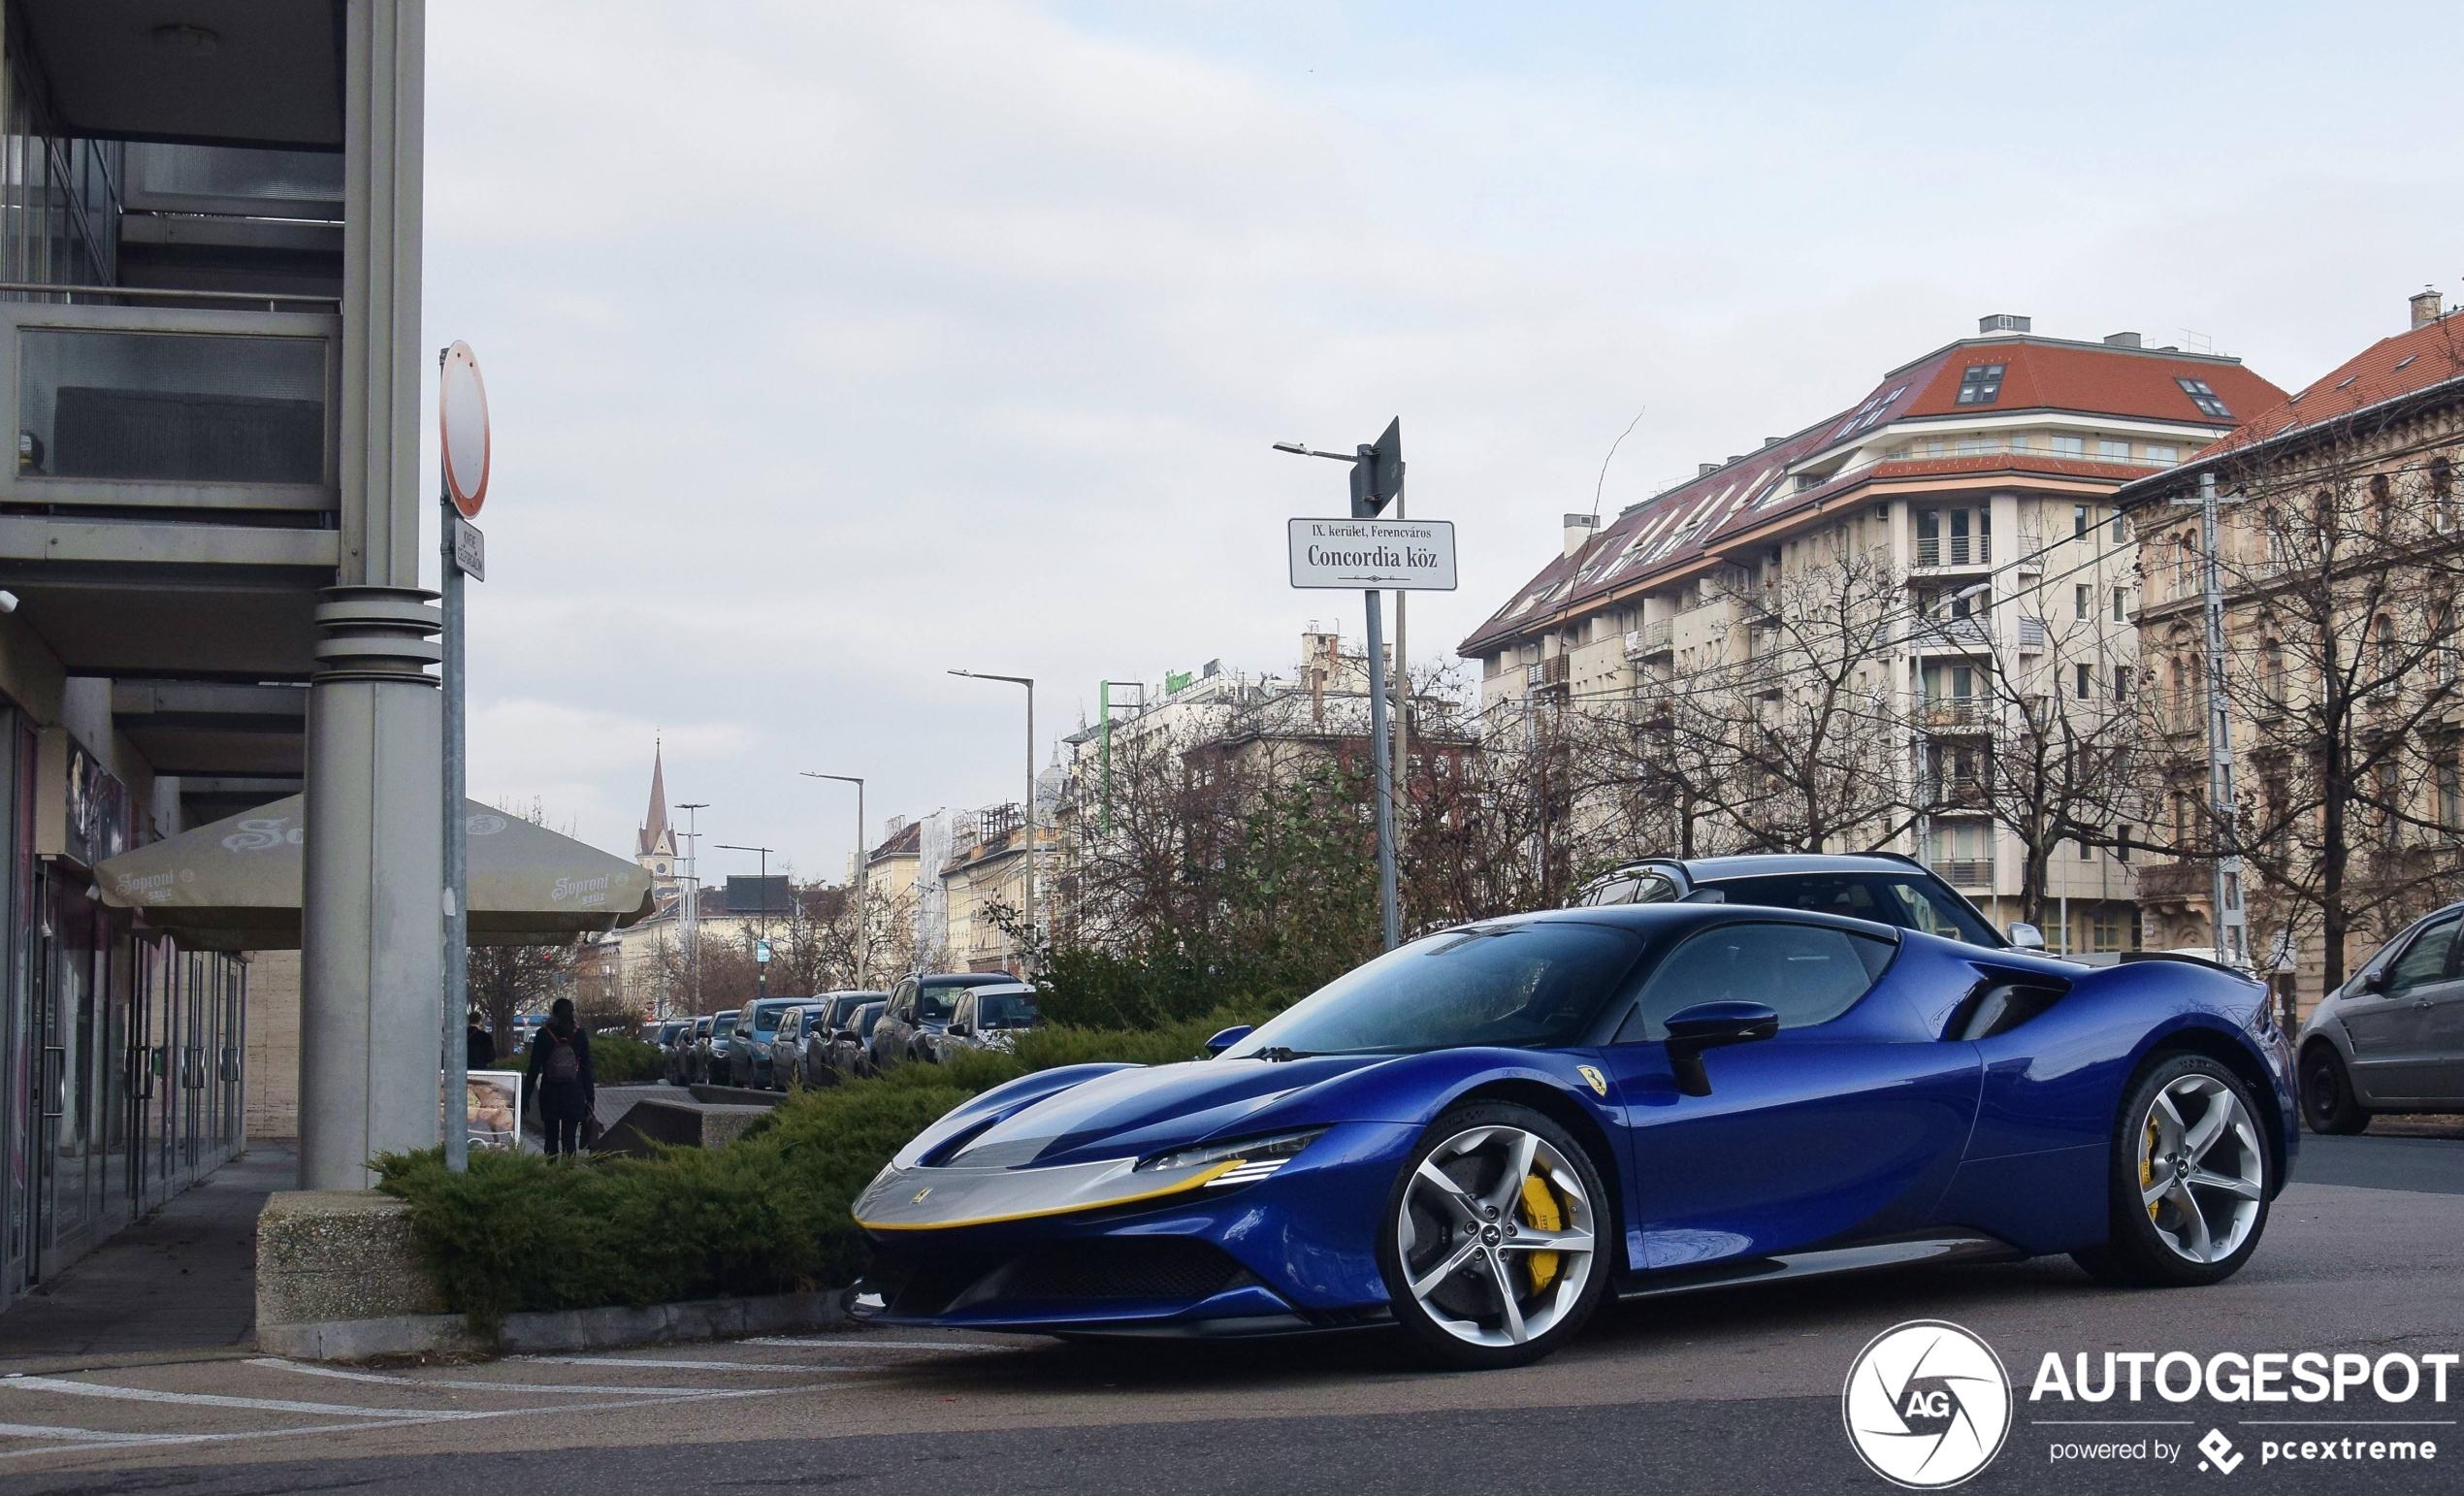 Ferrari SF90 Stradale is pure porno in het blauw